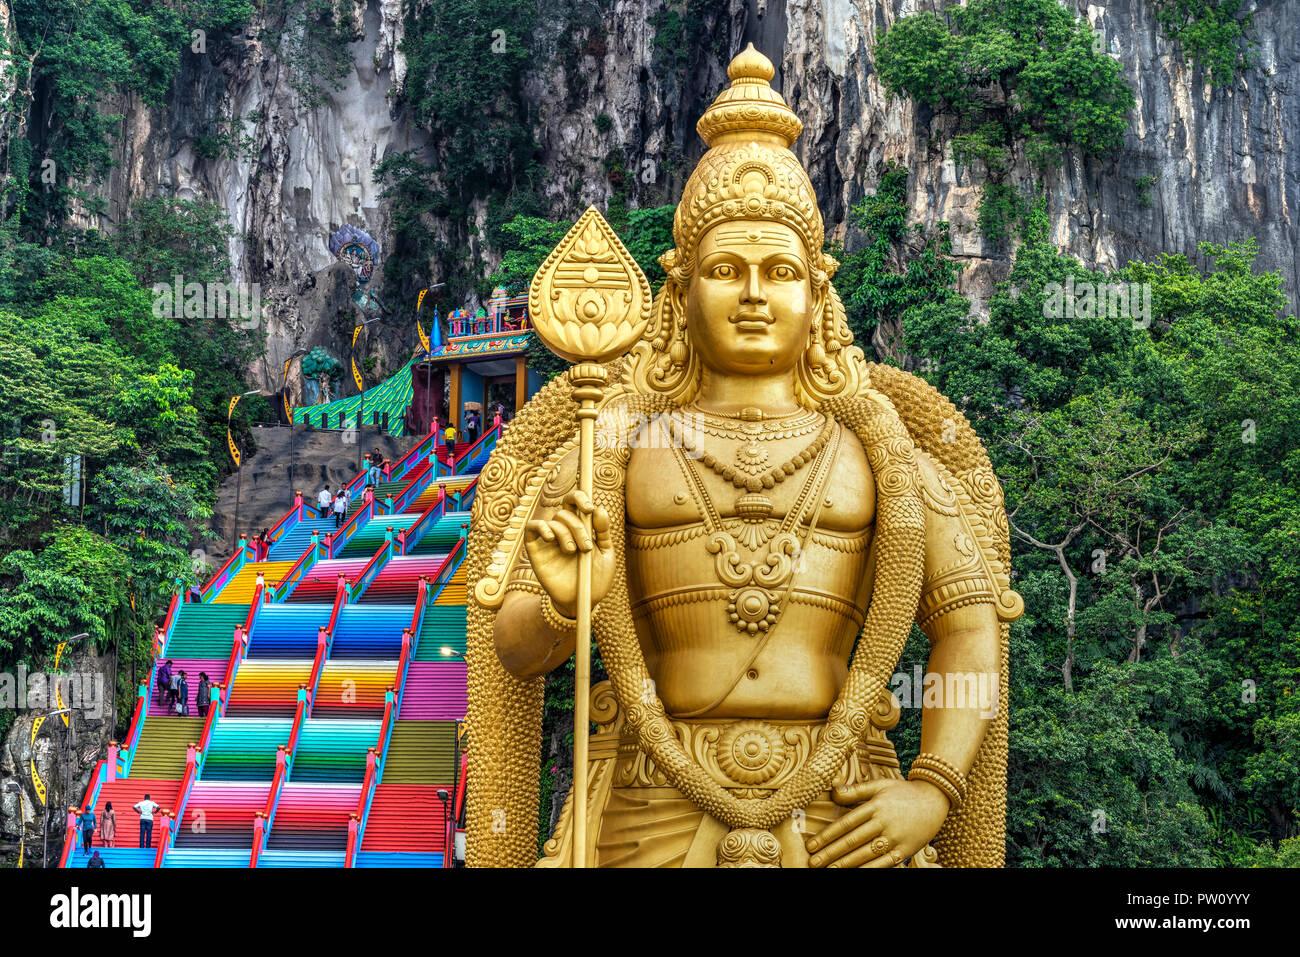 Entrée de grottes de Batu avec la statue de Murugan, Selangor, Kuala Lumpur, Malaisie Photo Stock